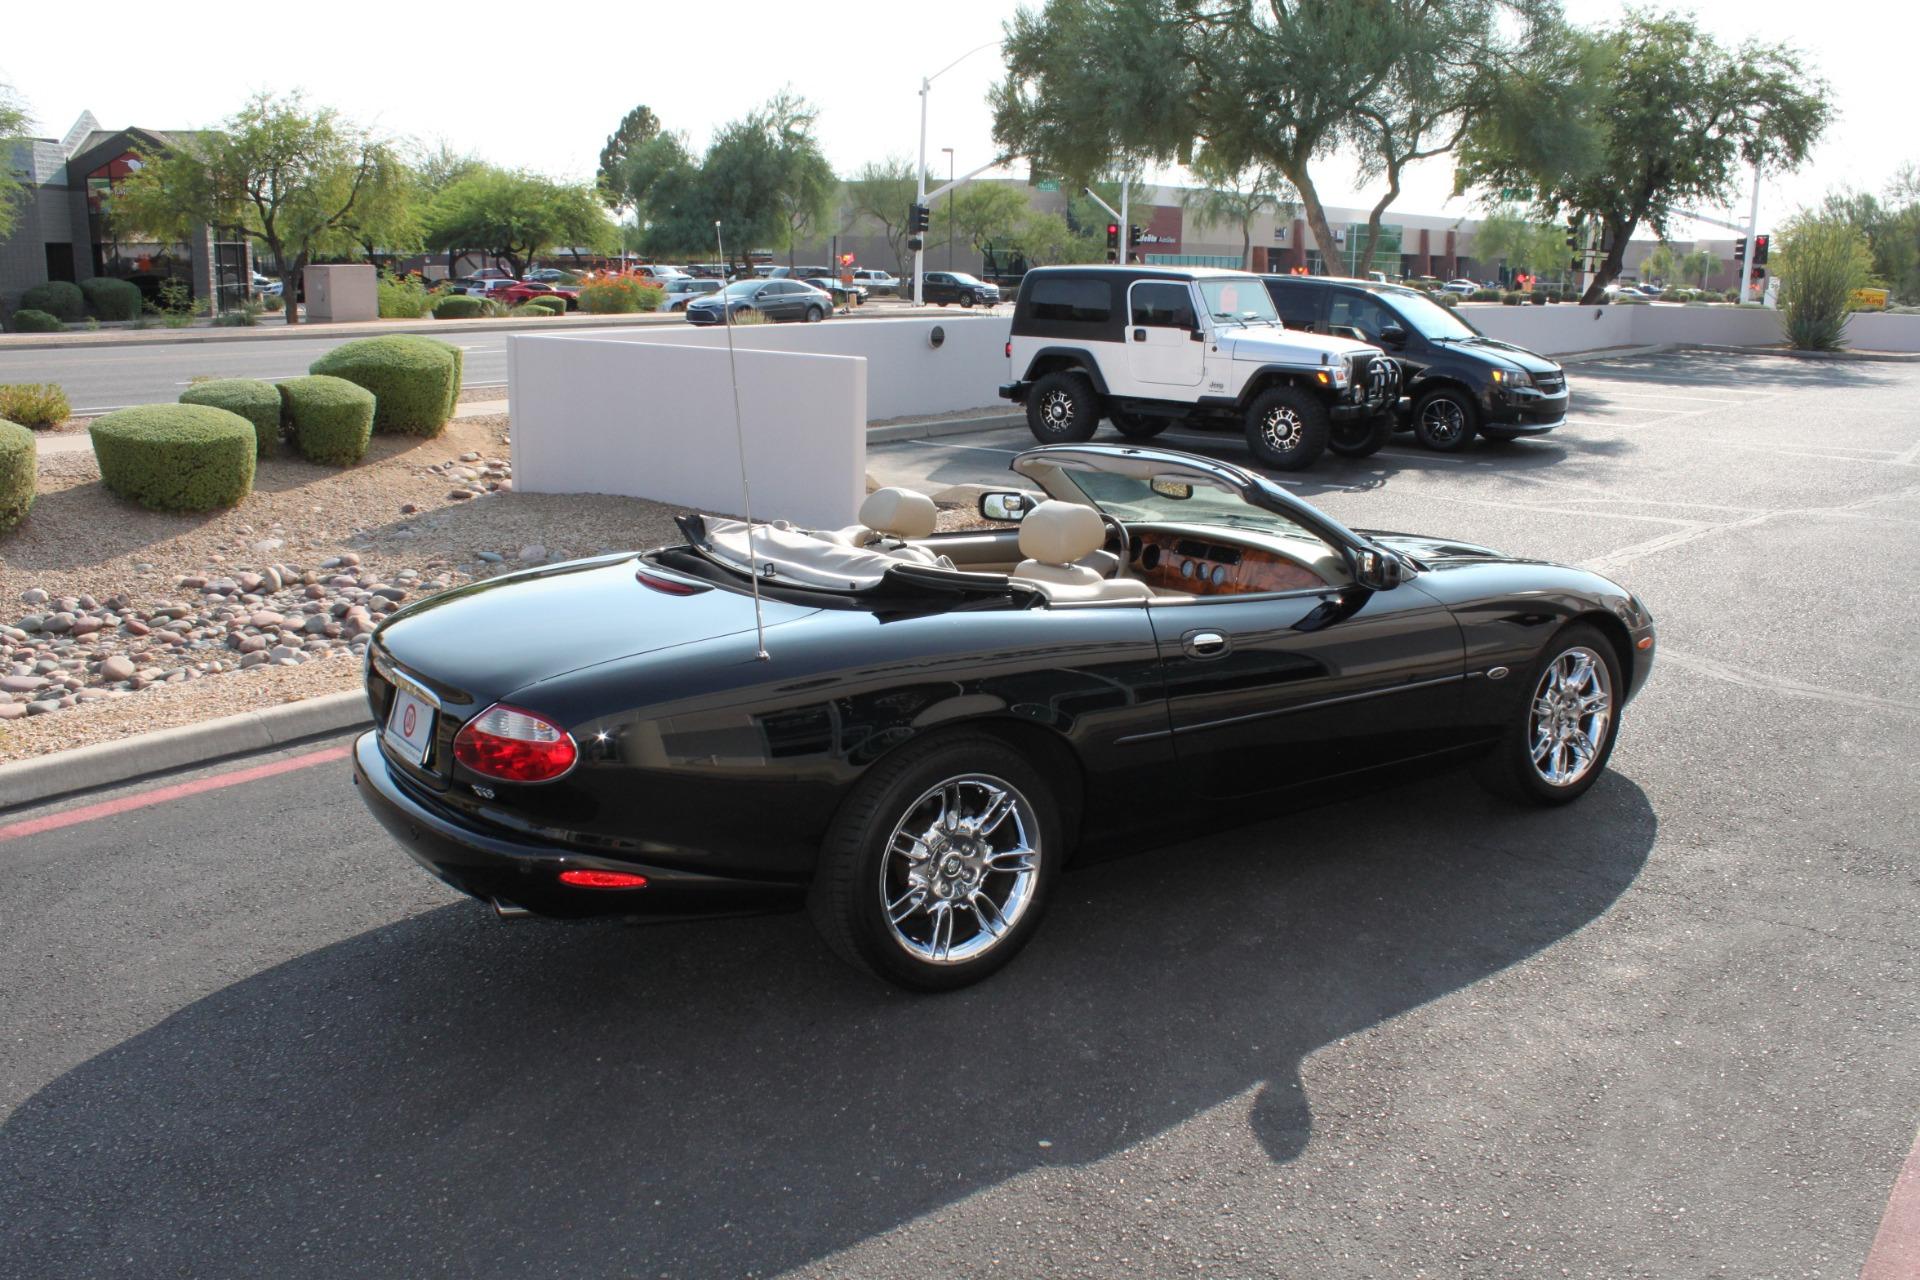 Used-2002-Jaguar-XK8-Convertible-XK8-Mini